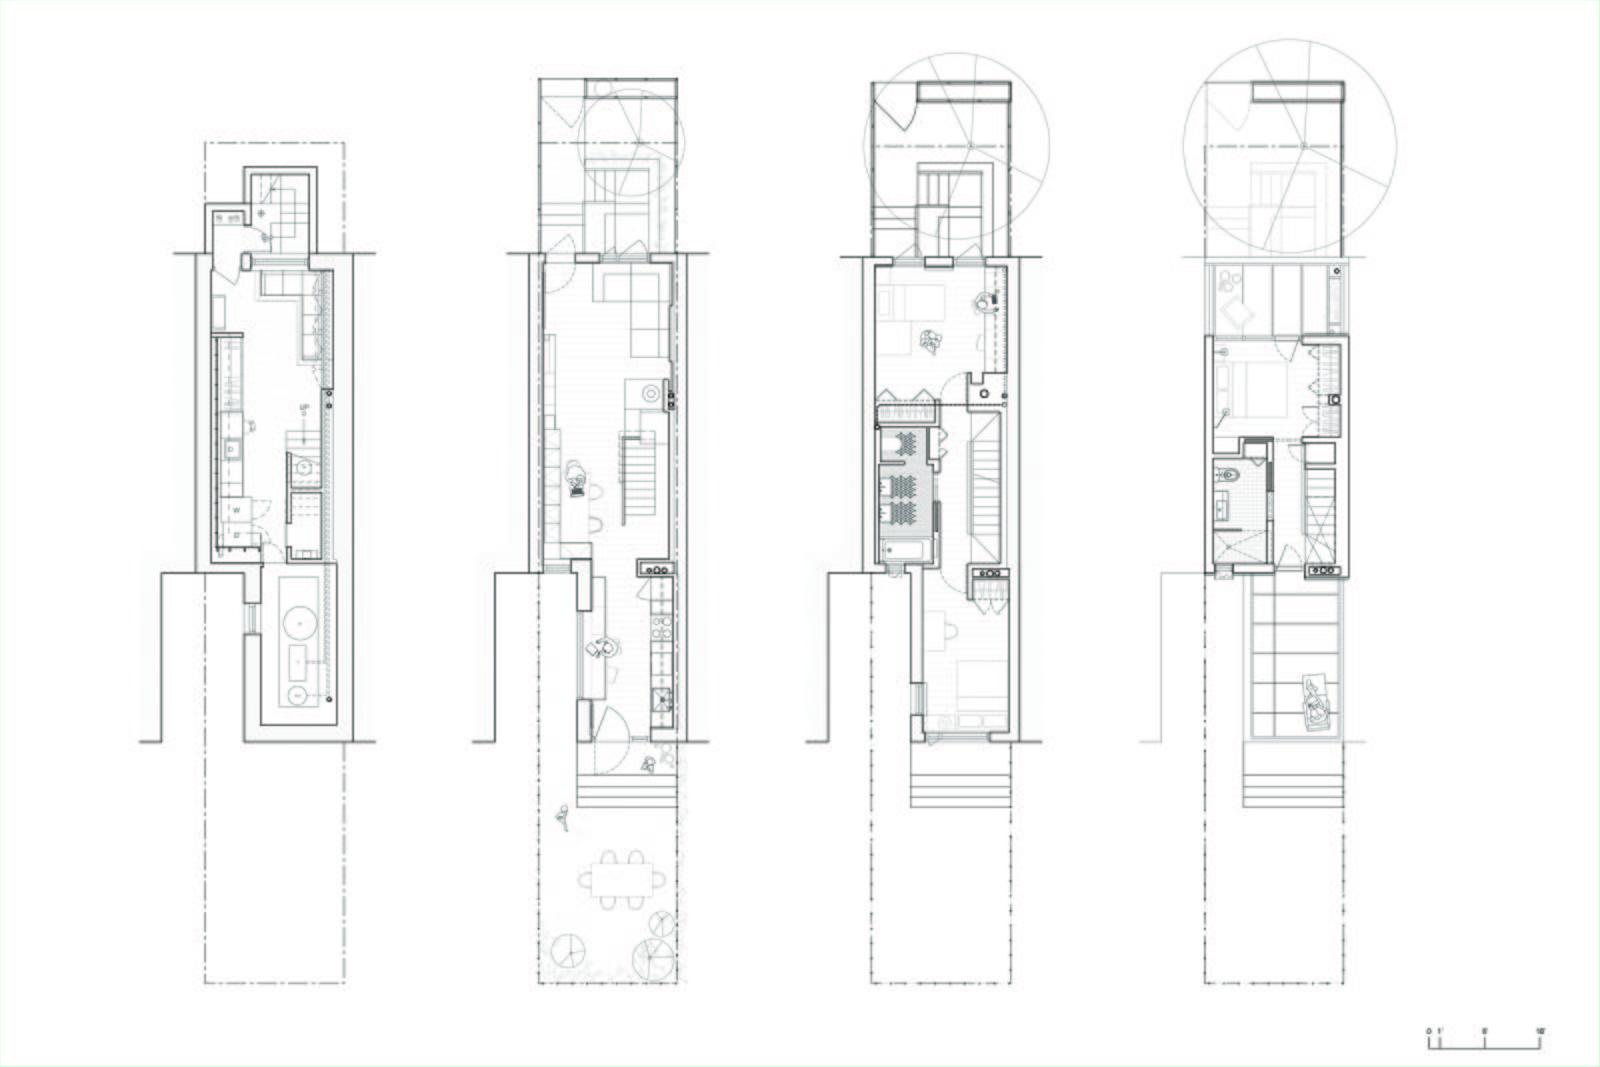 The floor plan of Little House, Big City.